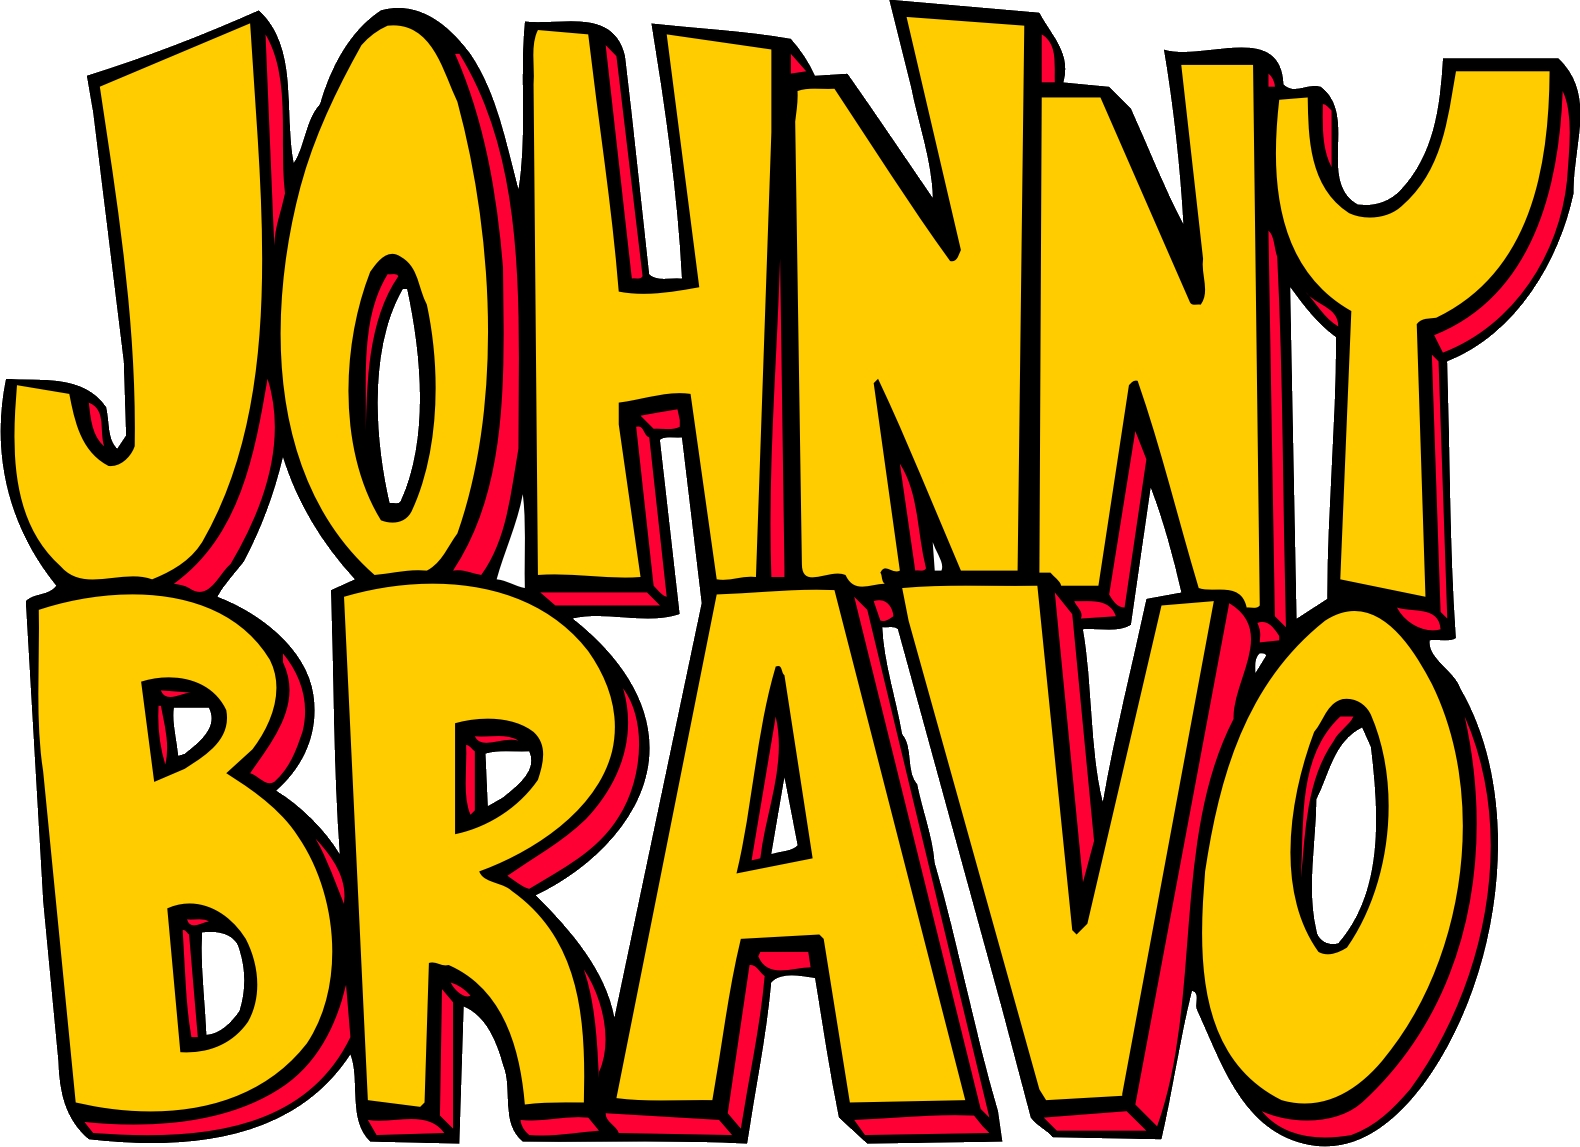 johnny bravo cartoon network logo adultcartoonco